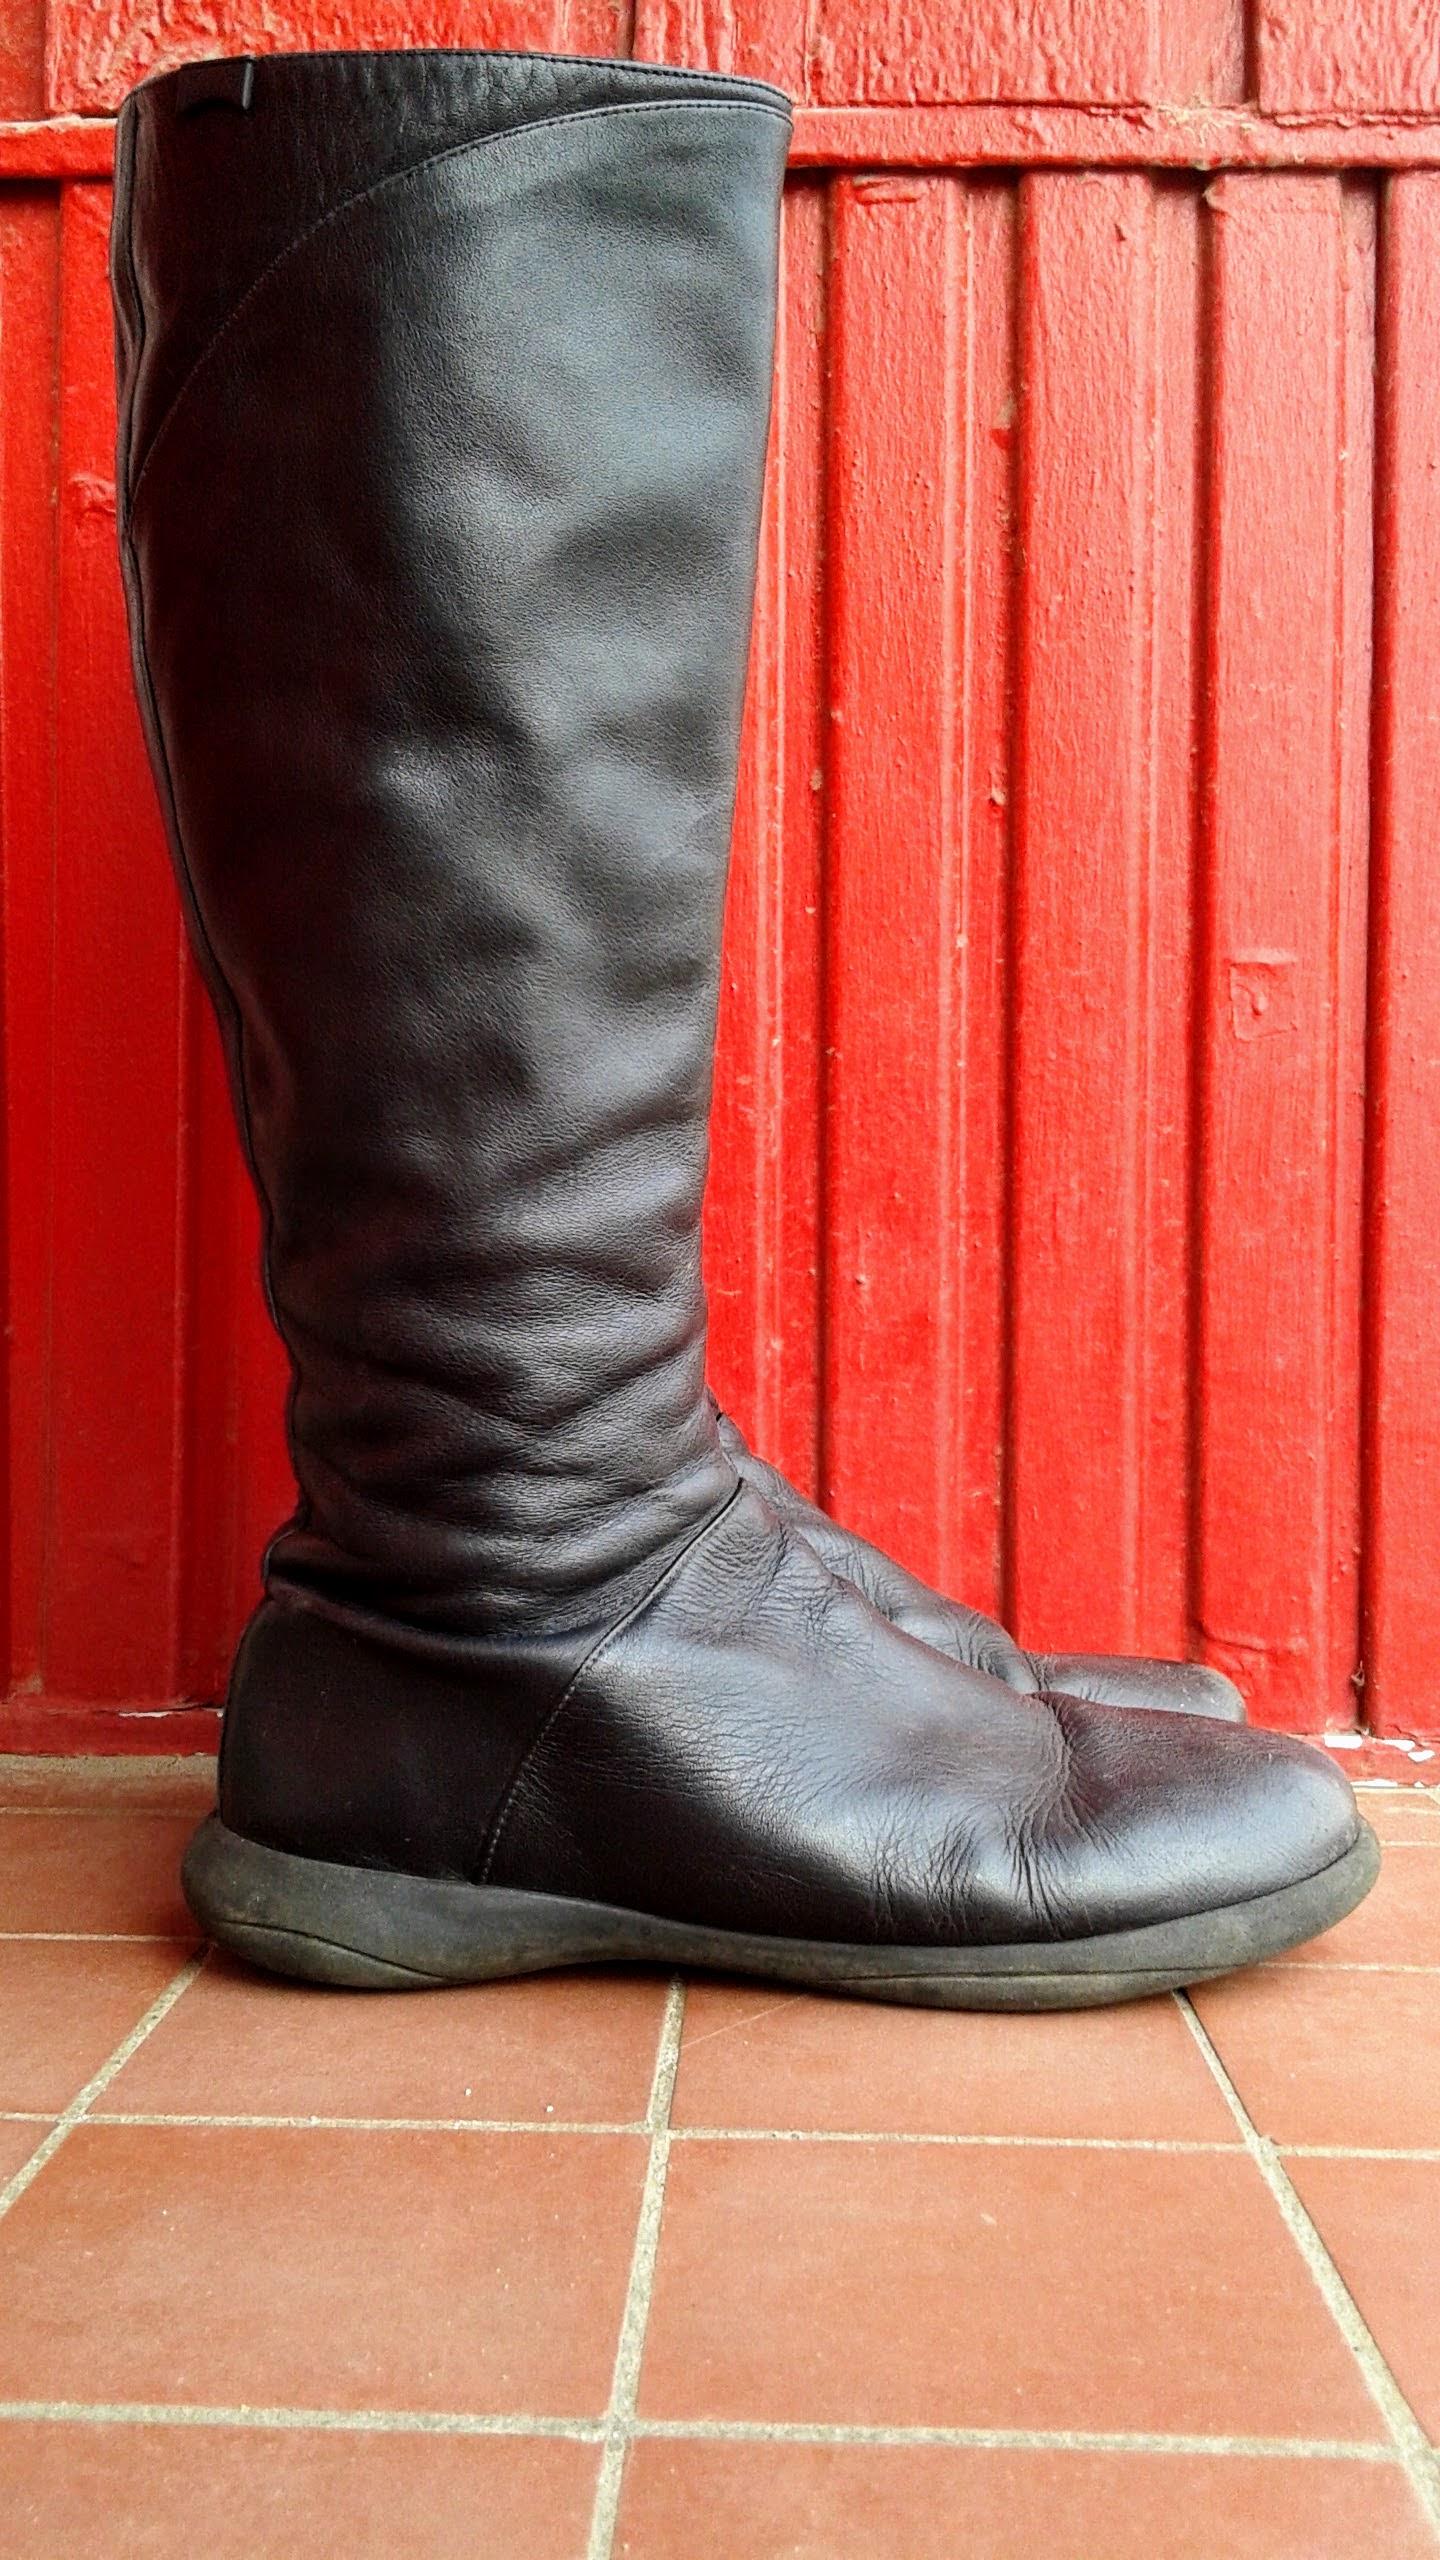 Camper boots; S8, $85